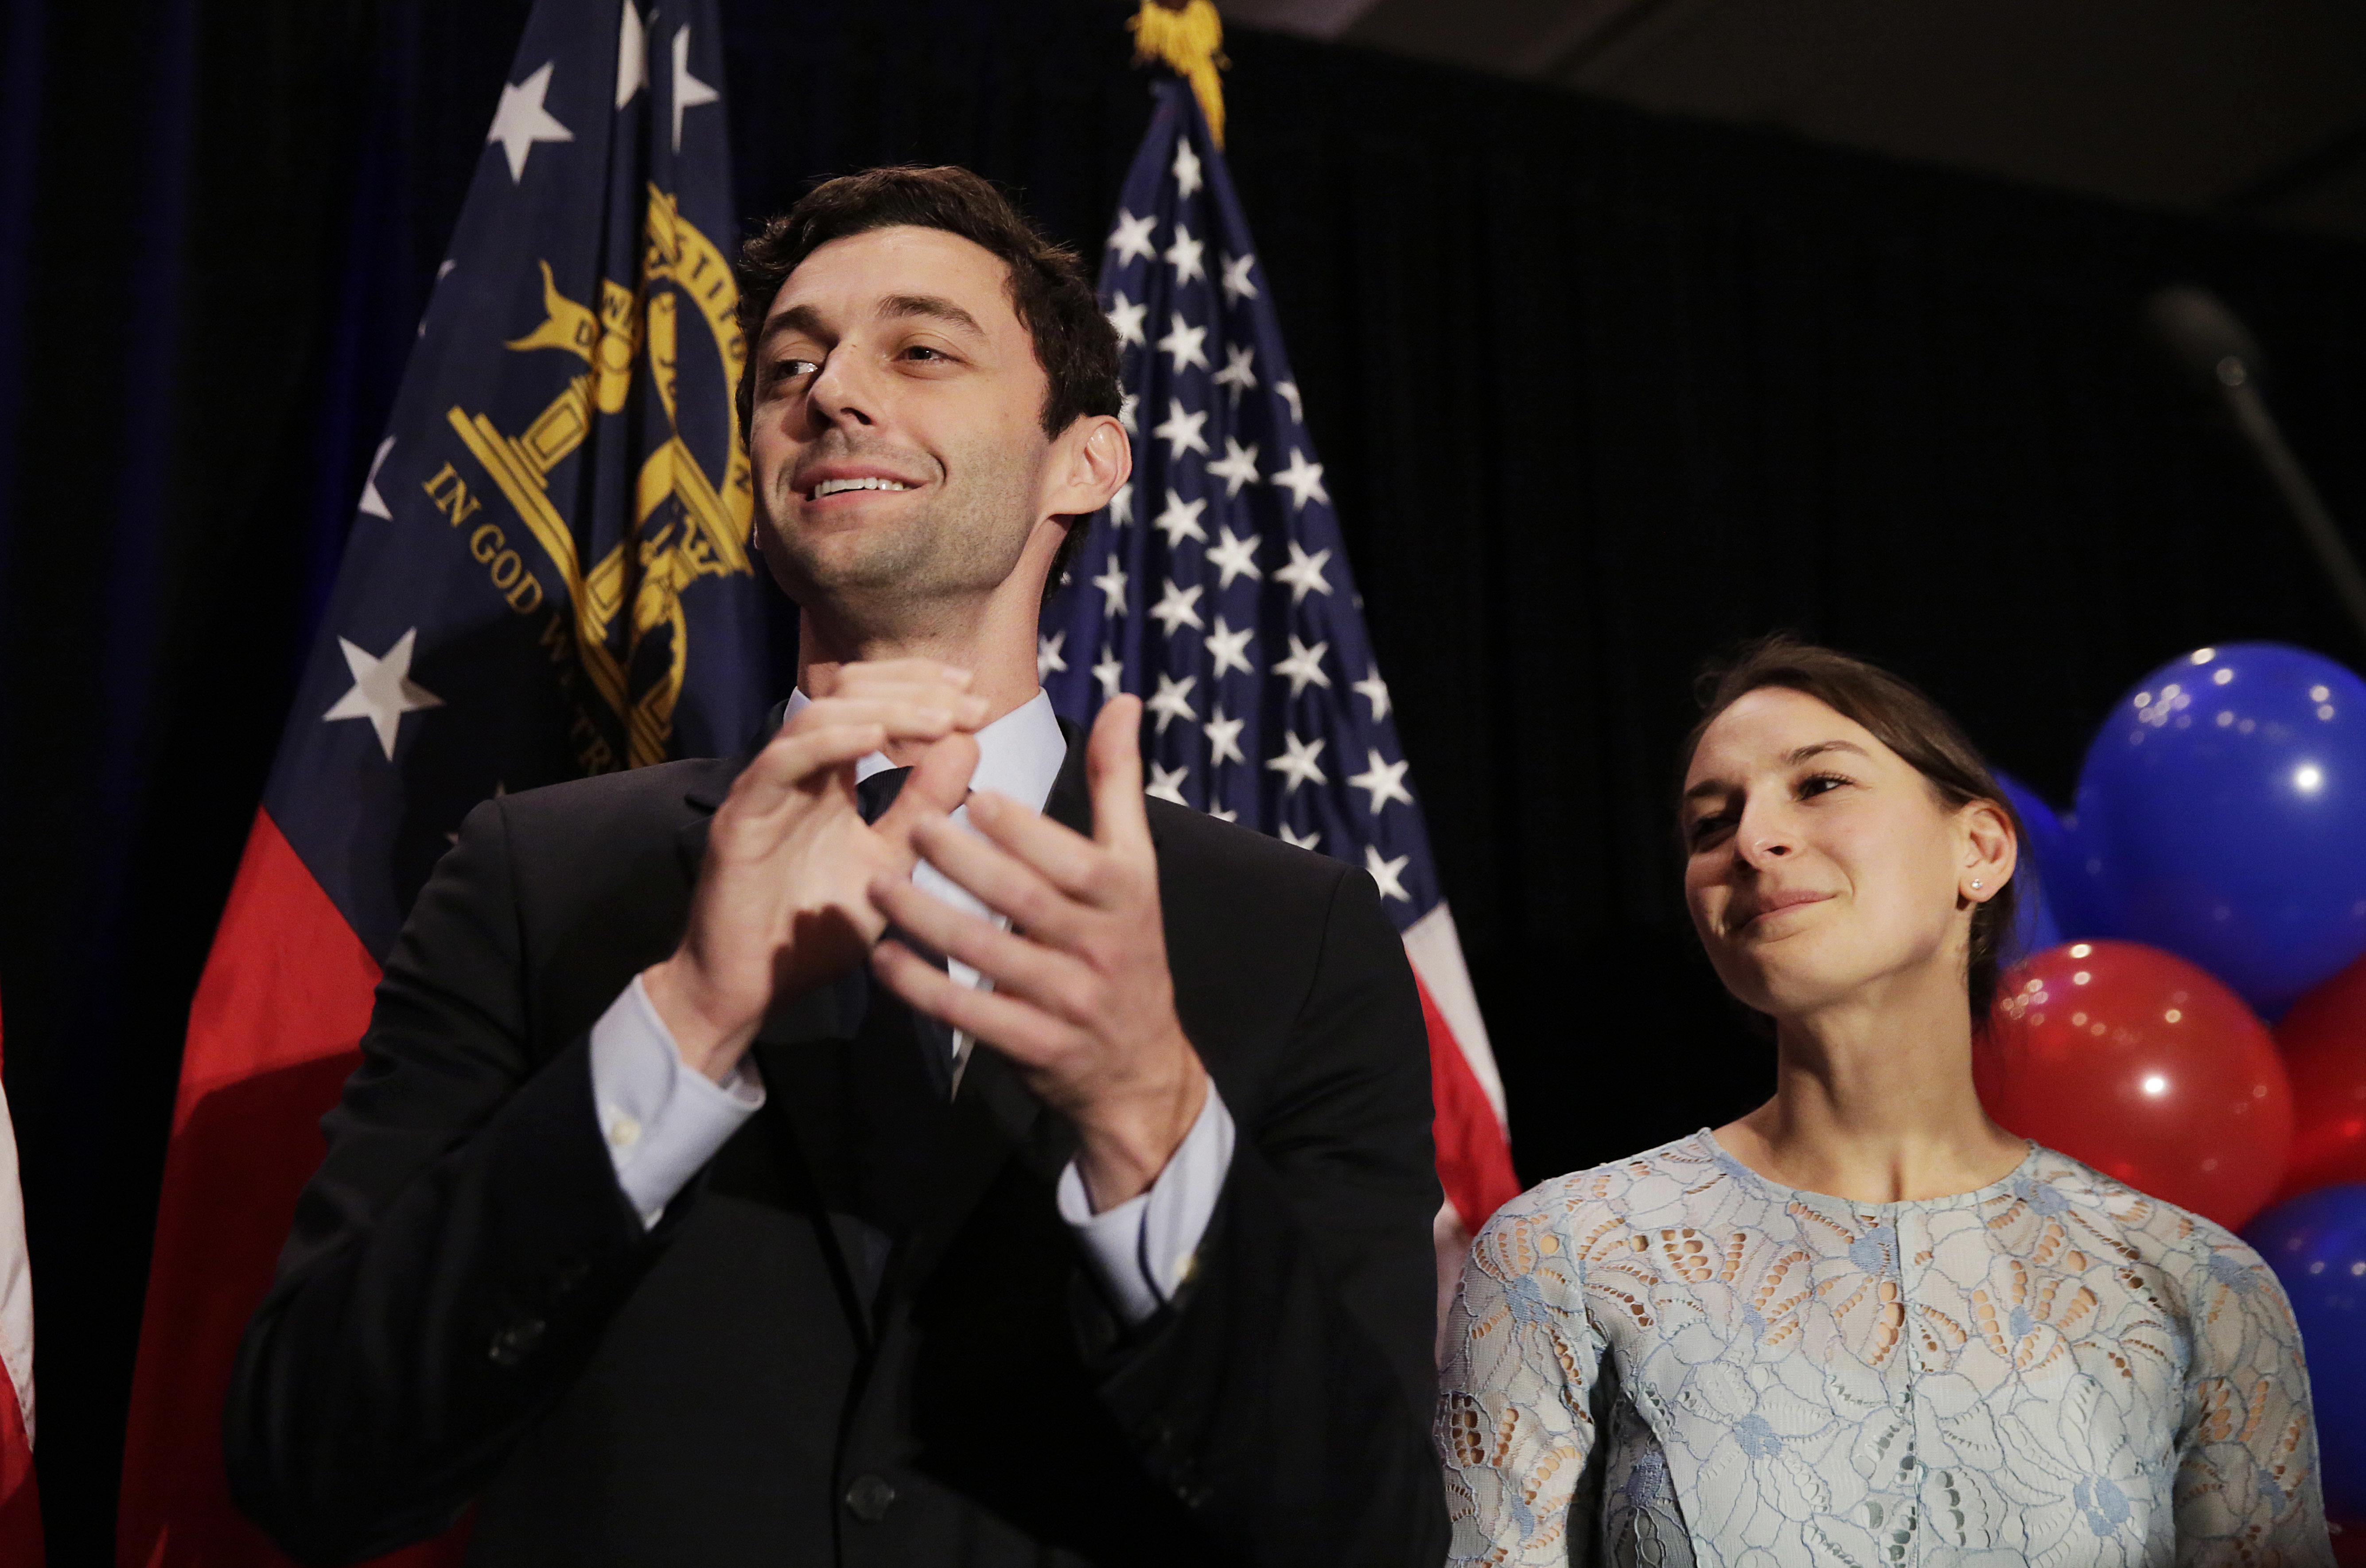 Jon Ossoff, Dem, seeks to unseat David Perdue, Republican, in Georgia